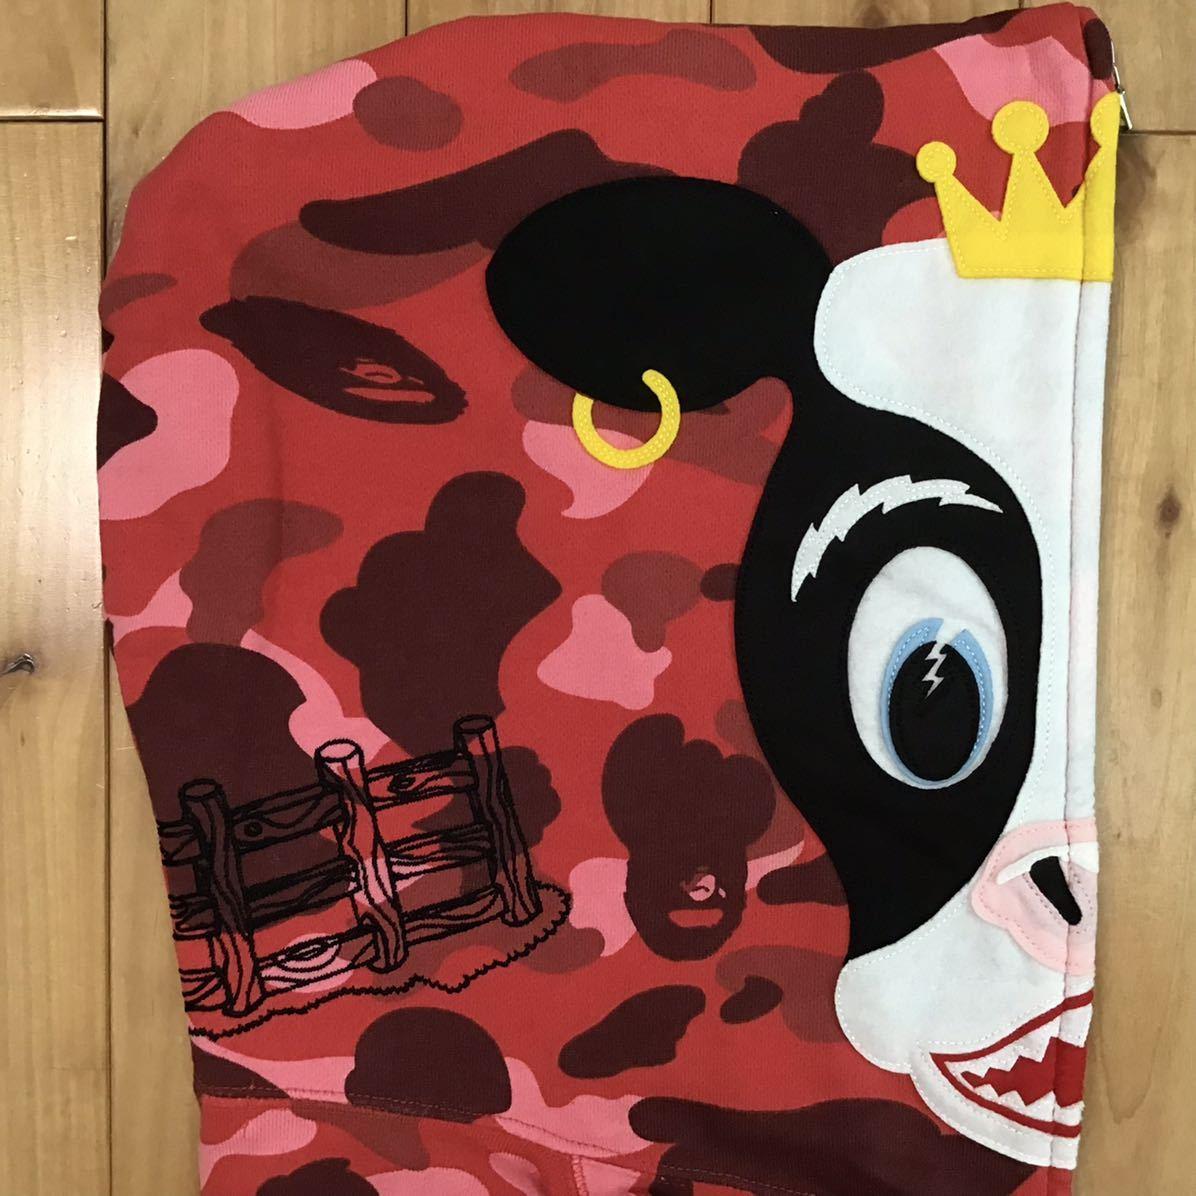 ★NFS限定★ pharrell camo ホルスタイン パーカー Mサイズ Holstein full zip hoodie a bathing ape BAPE エイプ ベイプ red camo 迷彩 53